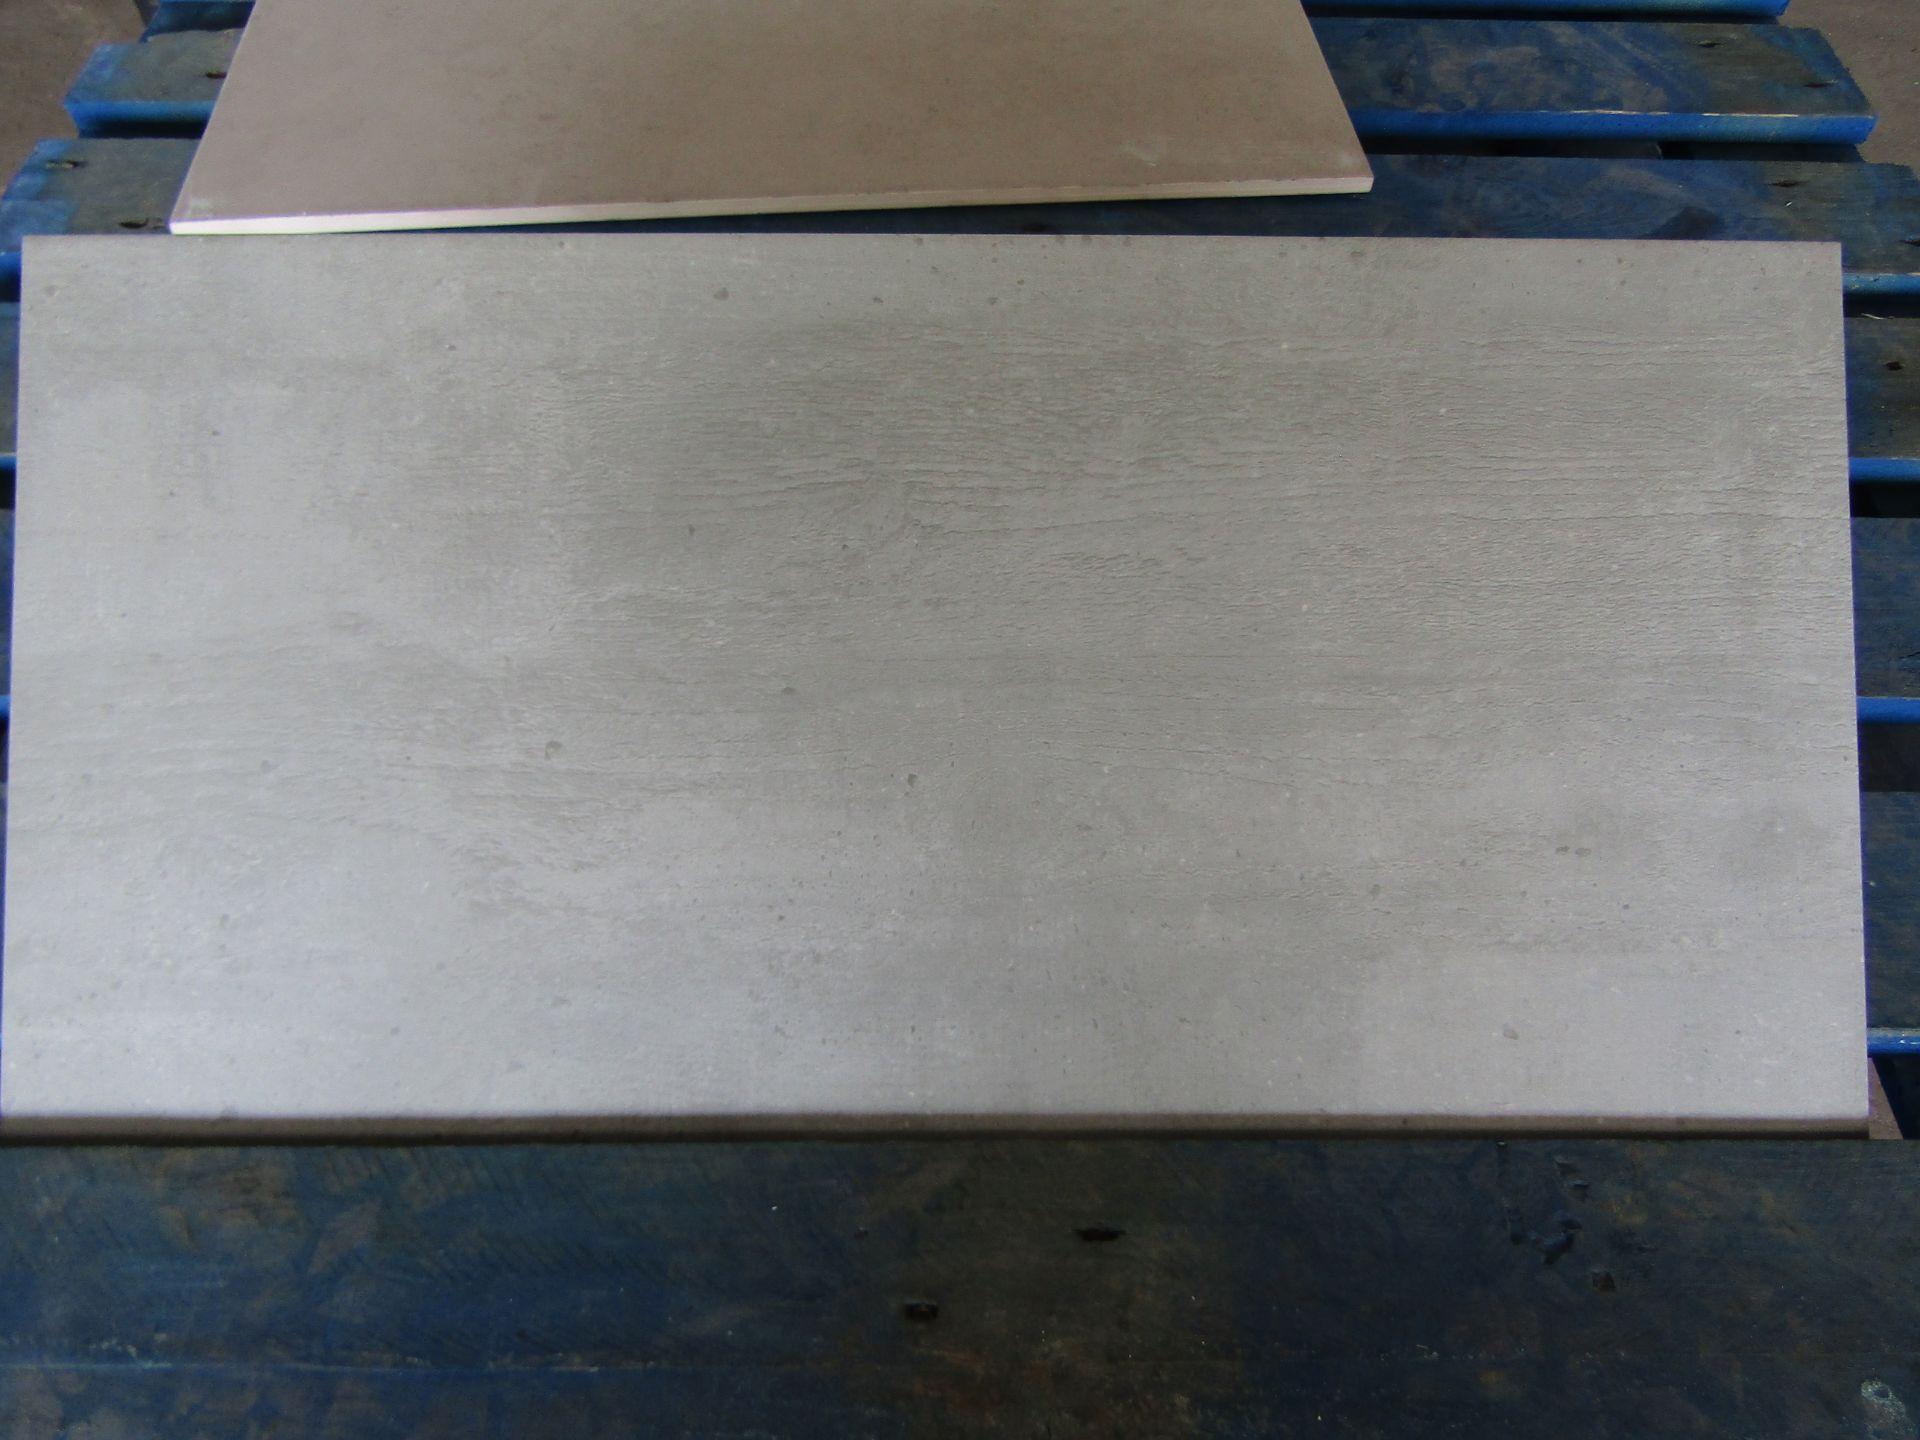 Pallet of 40x Packs of 5 Sherwood smoke Matt finish 300x600 wall and Floor Tiles By Johnsons, New,